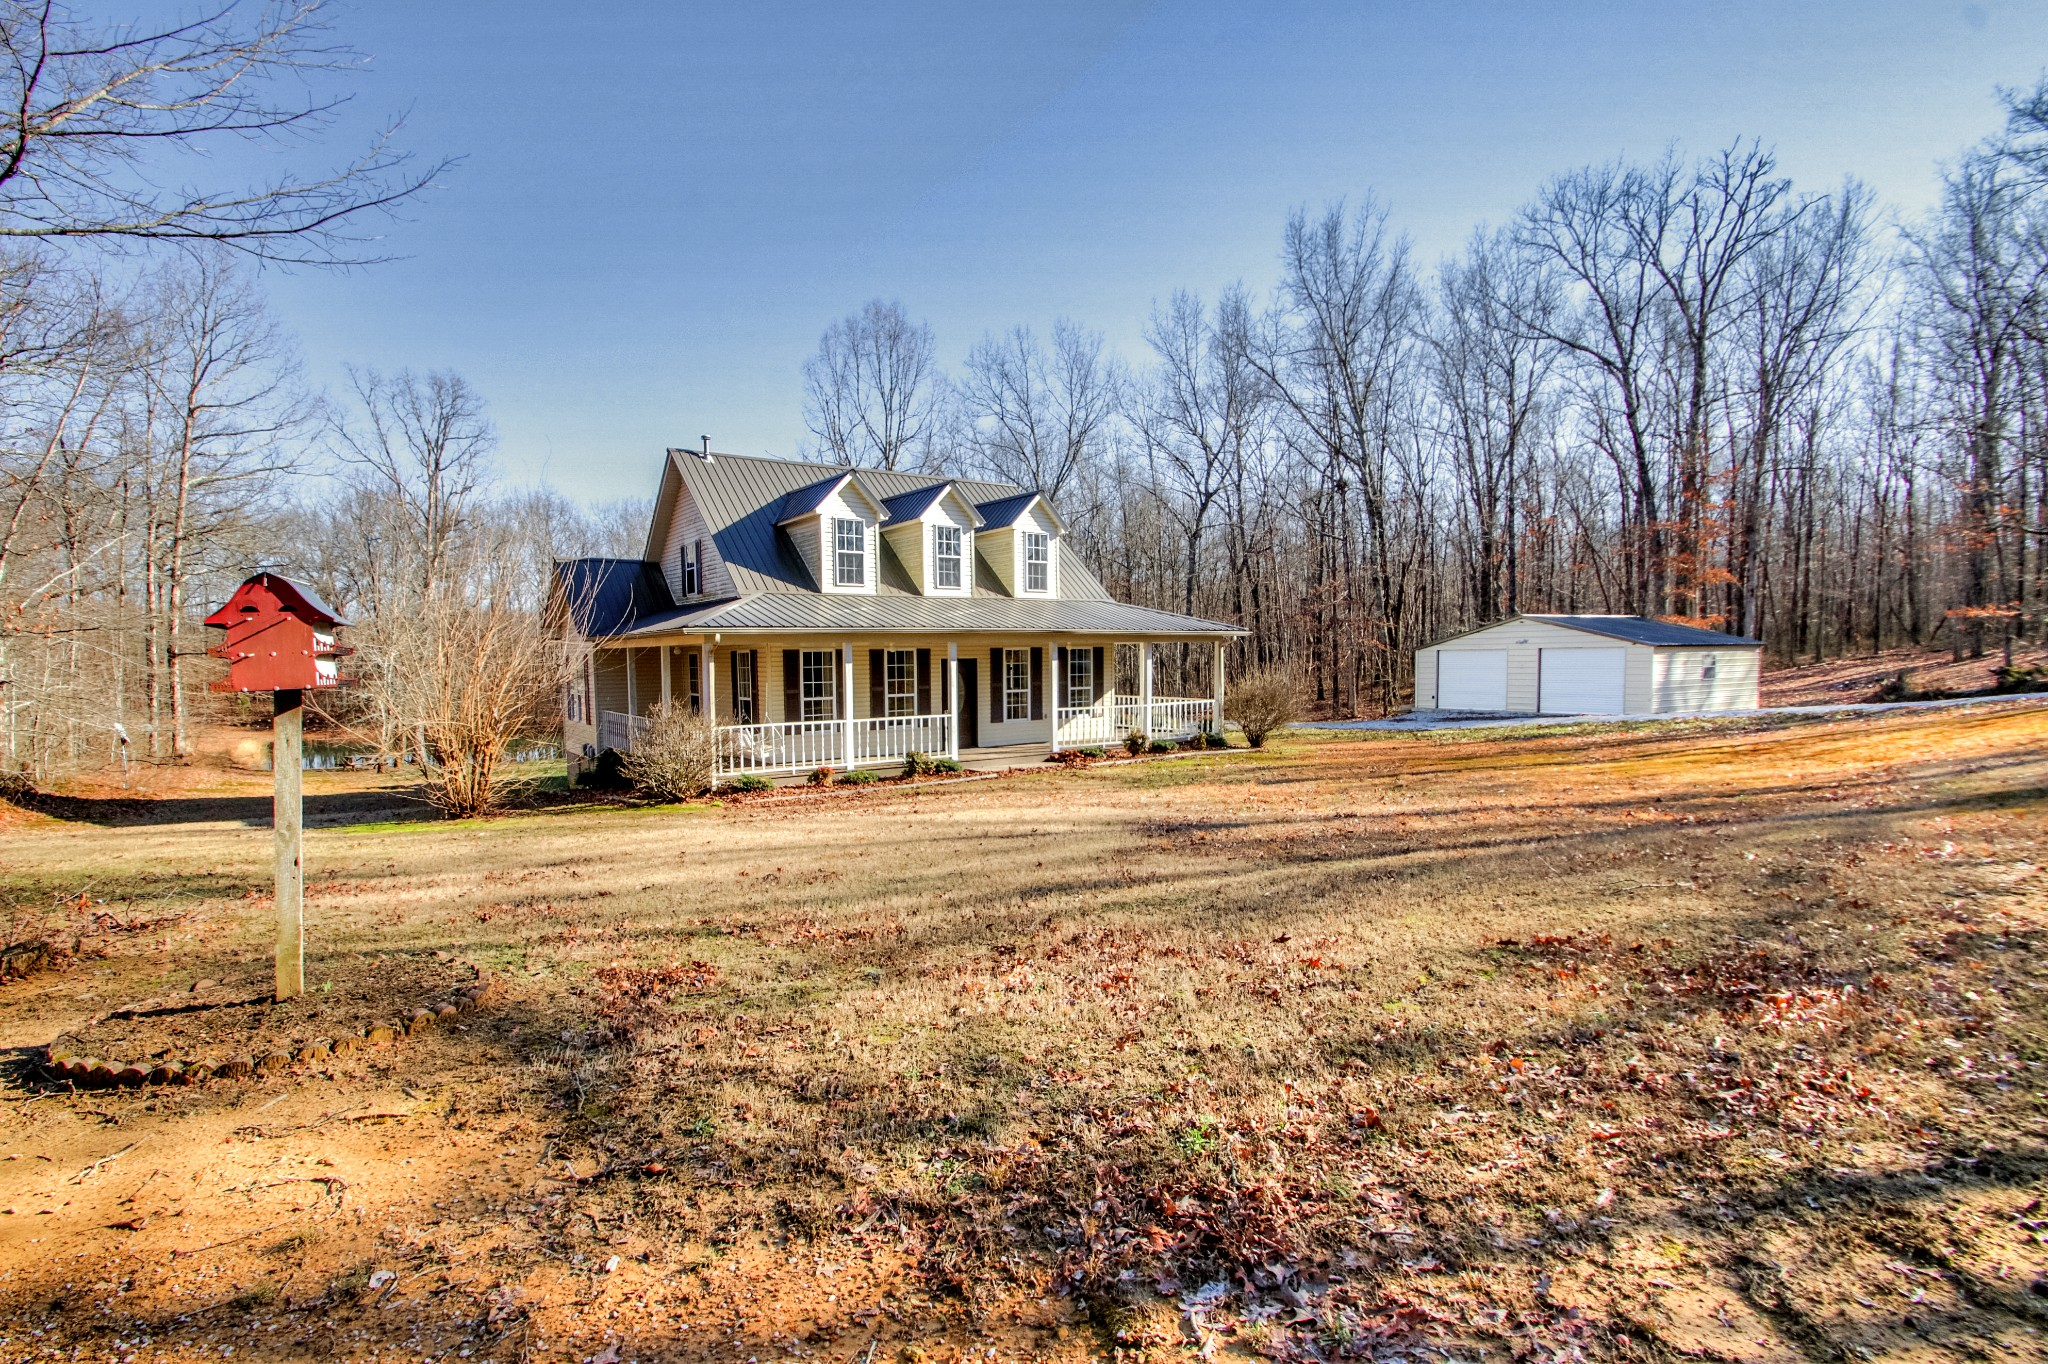 1833 Deer Run Rd, Altamont, TN 37301 - Altamont, TN real estate listing